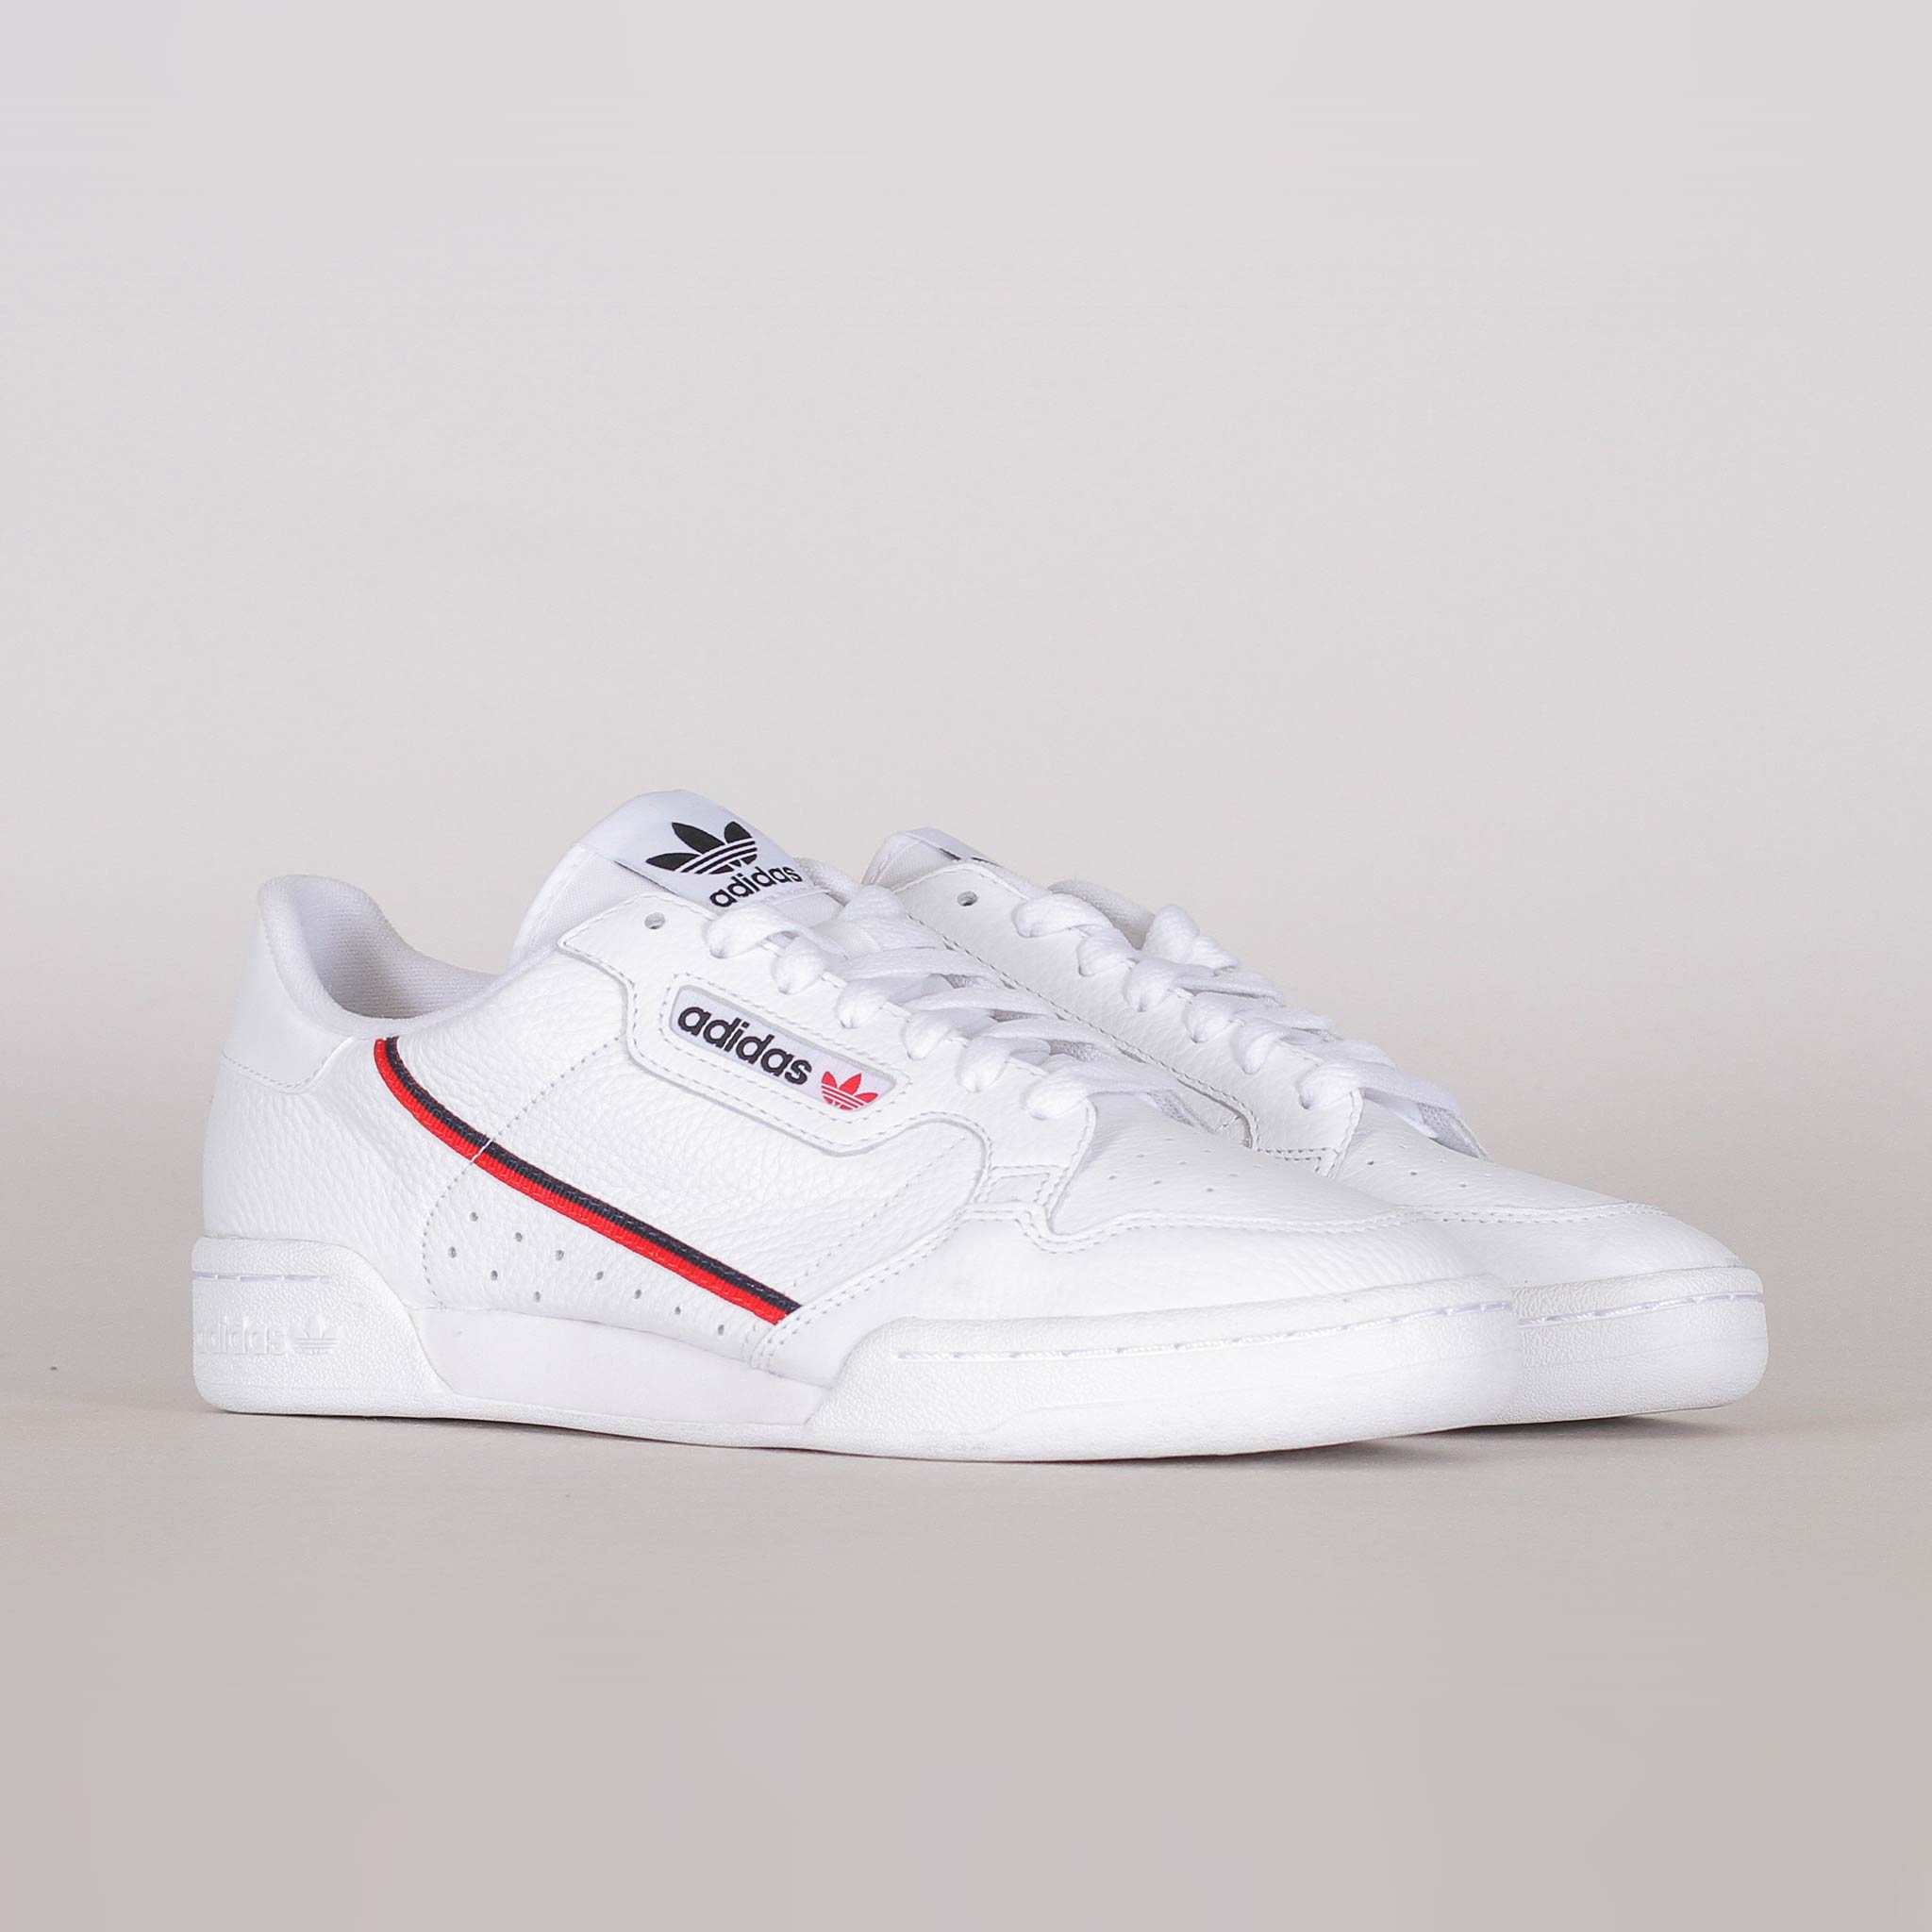 Adidas Originals Continental 80 (G27706)